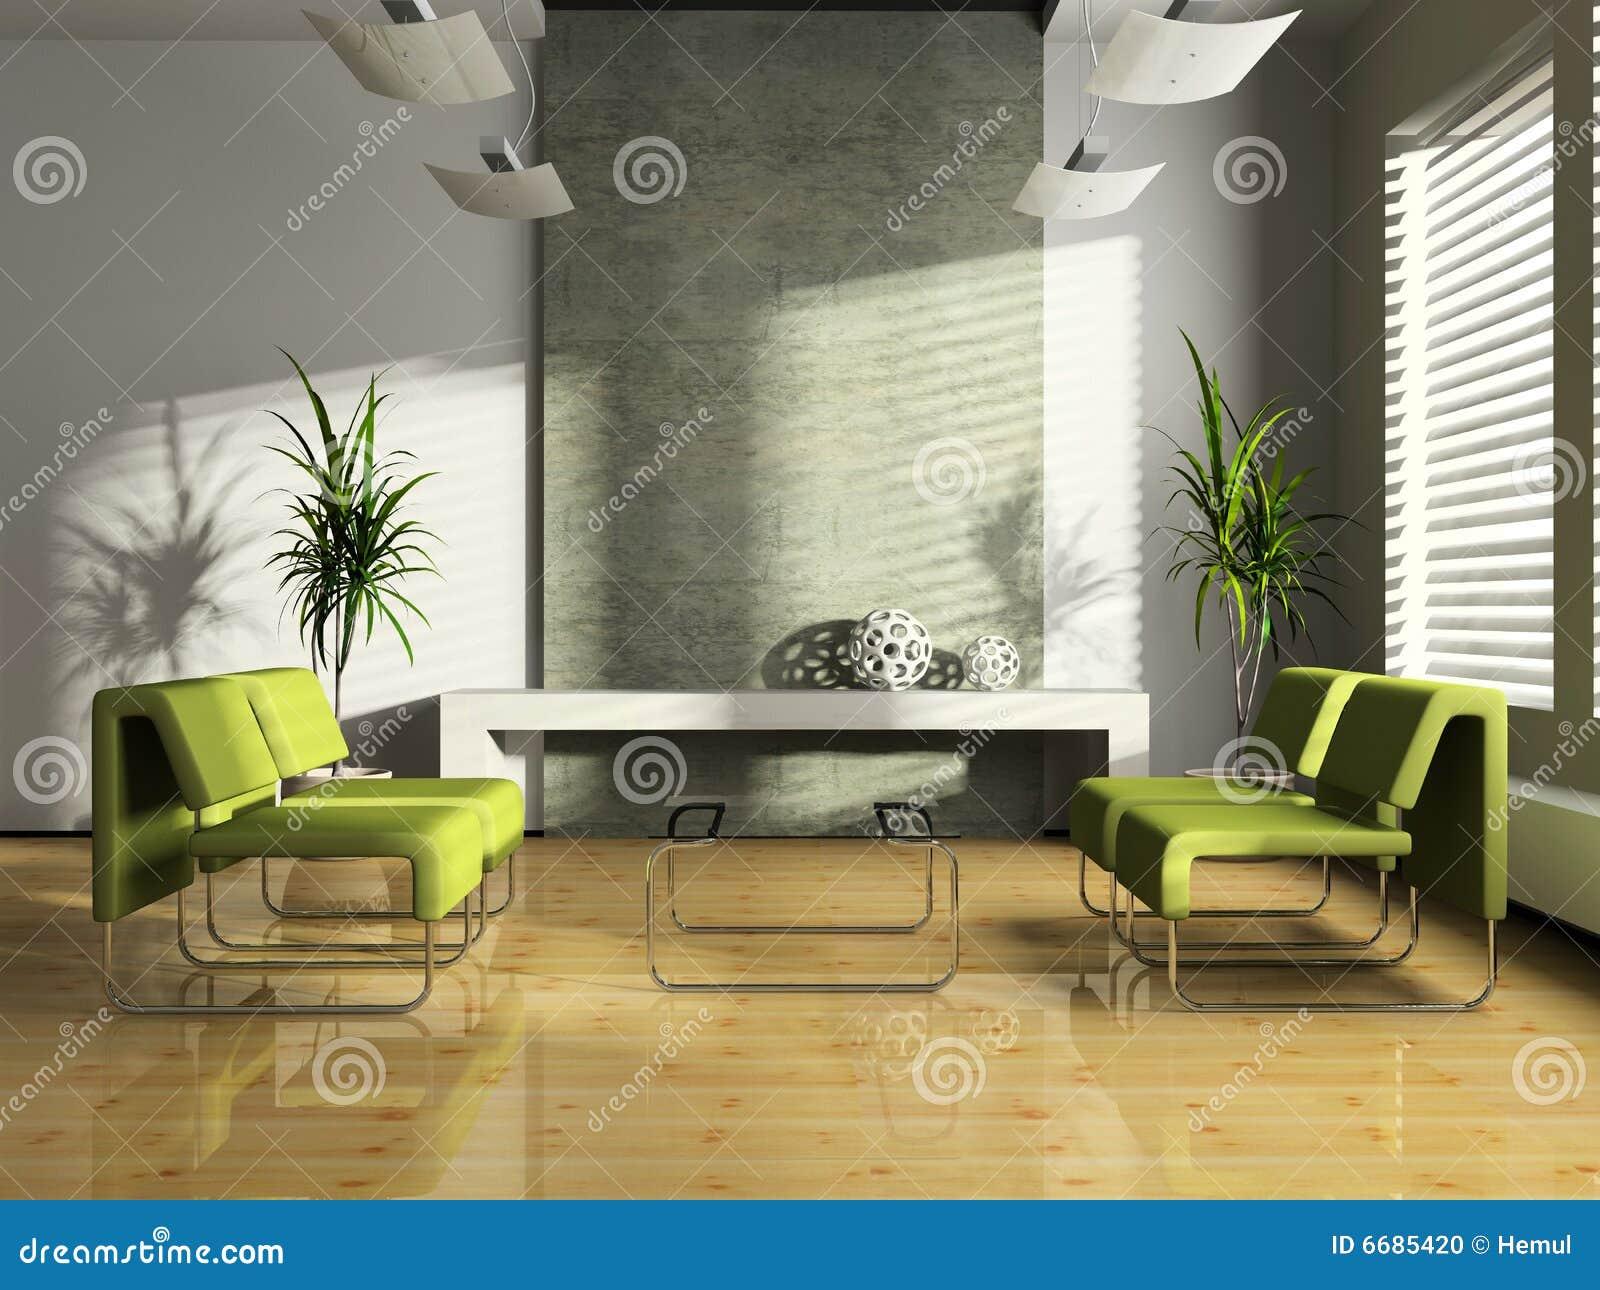 Waiting Area Design Ideas